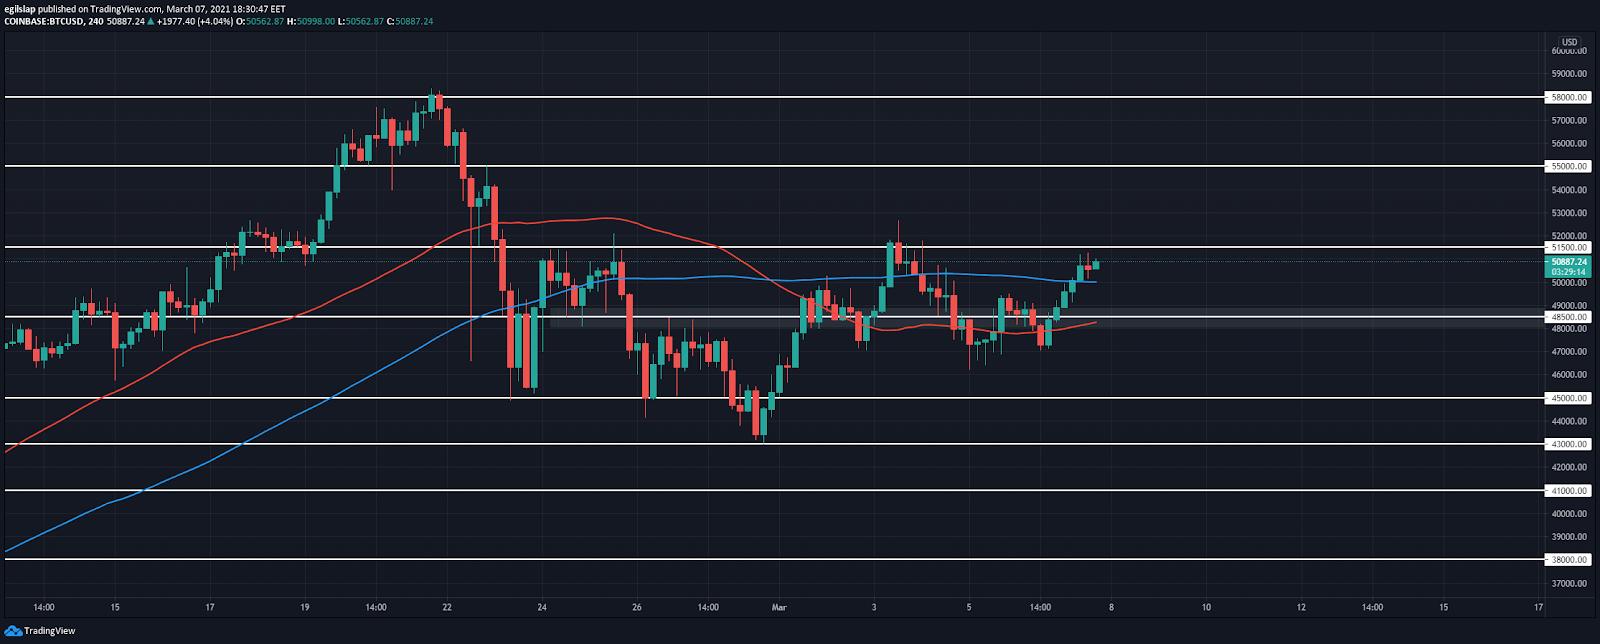 Weekly Crypto Price Analysis 7th Mar: BTC, ETH, XRP, DOT, SUSHI 2